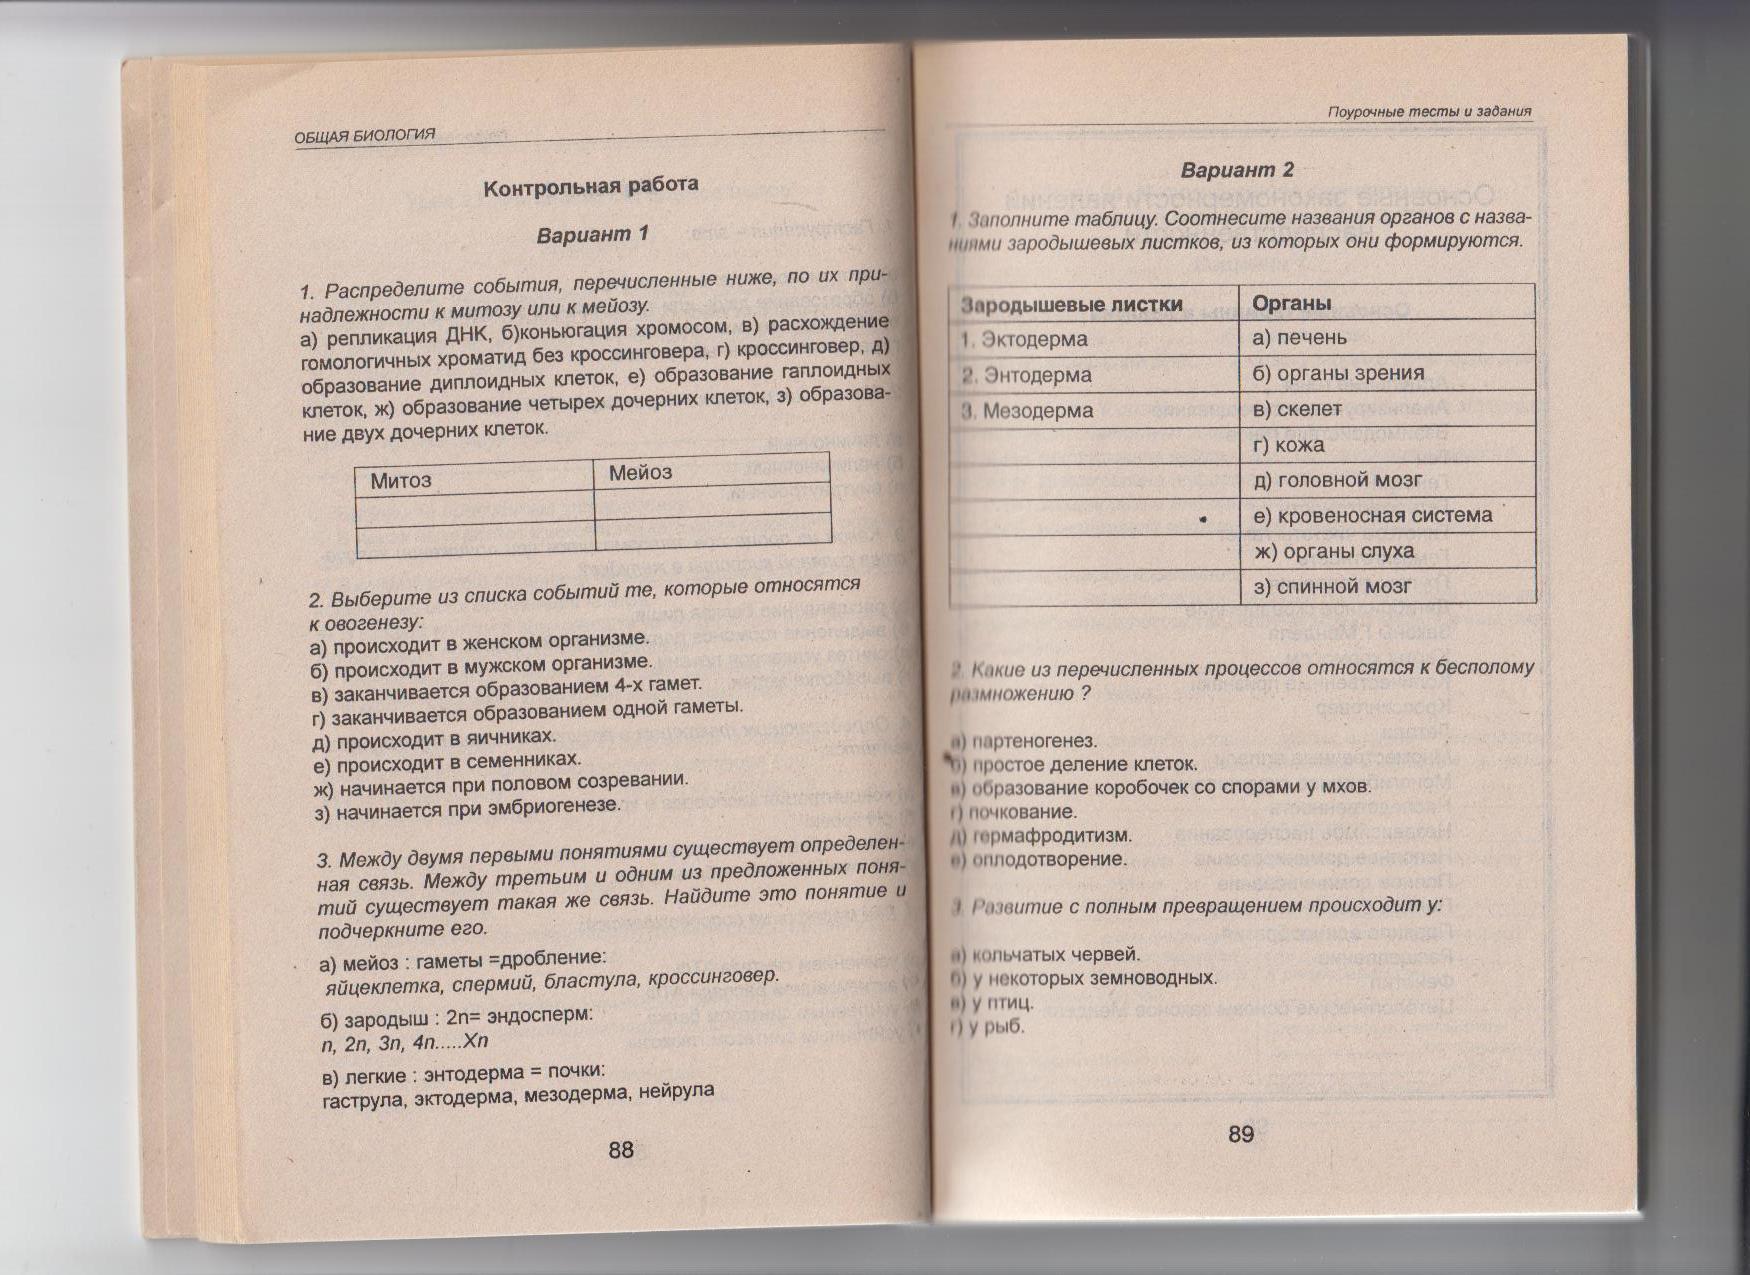 C:\Documents and Settings\Admin\Рабочий стол\10-11 класс к.р\Изображение 002.jpg